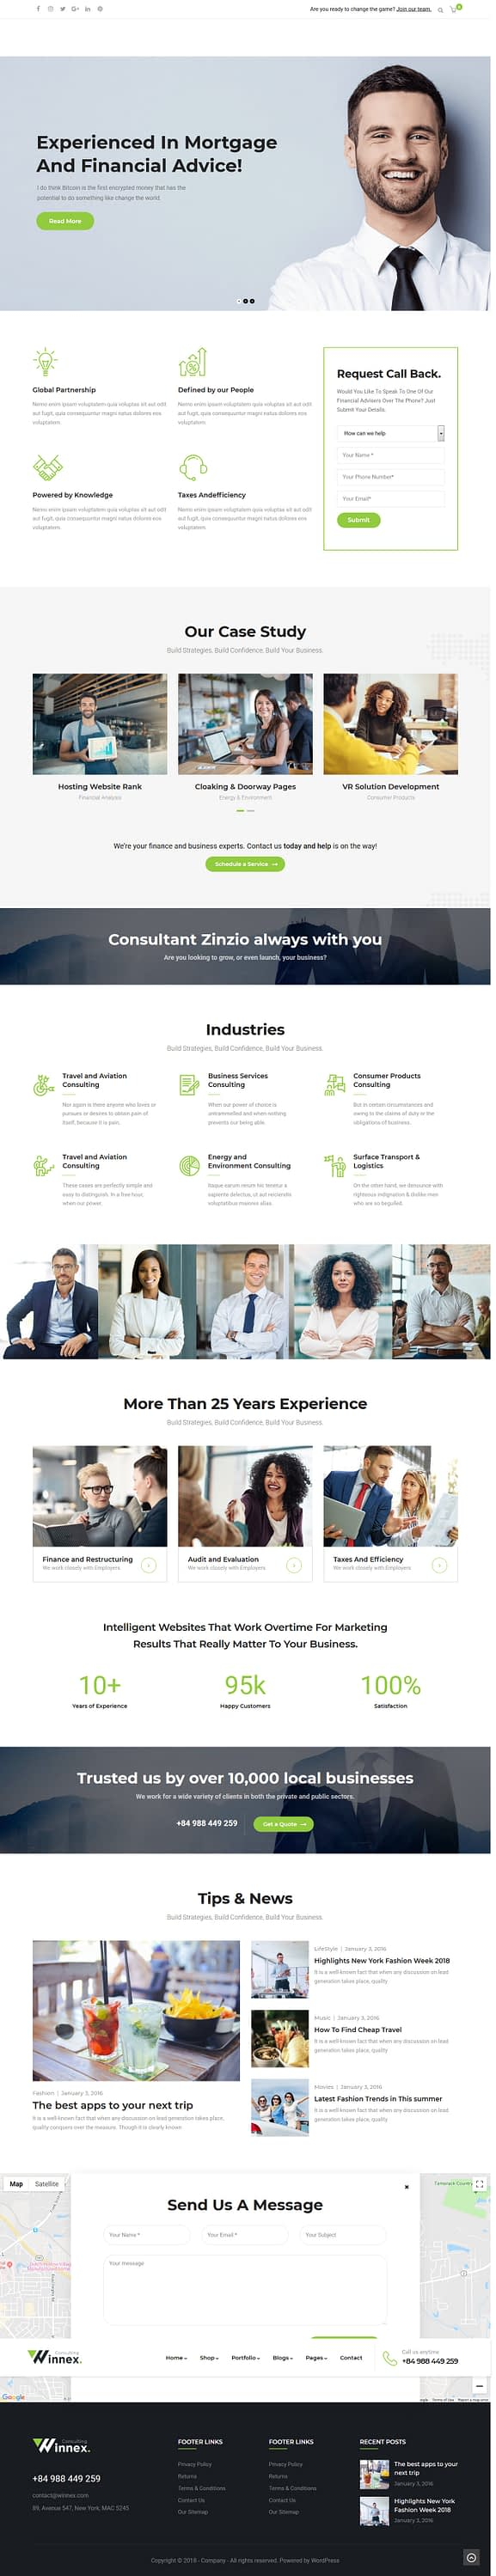 winnex best premium consultant wordpress theme - 10+ Best Premium Consulting WordPress Themes